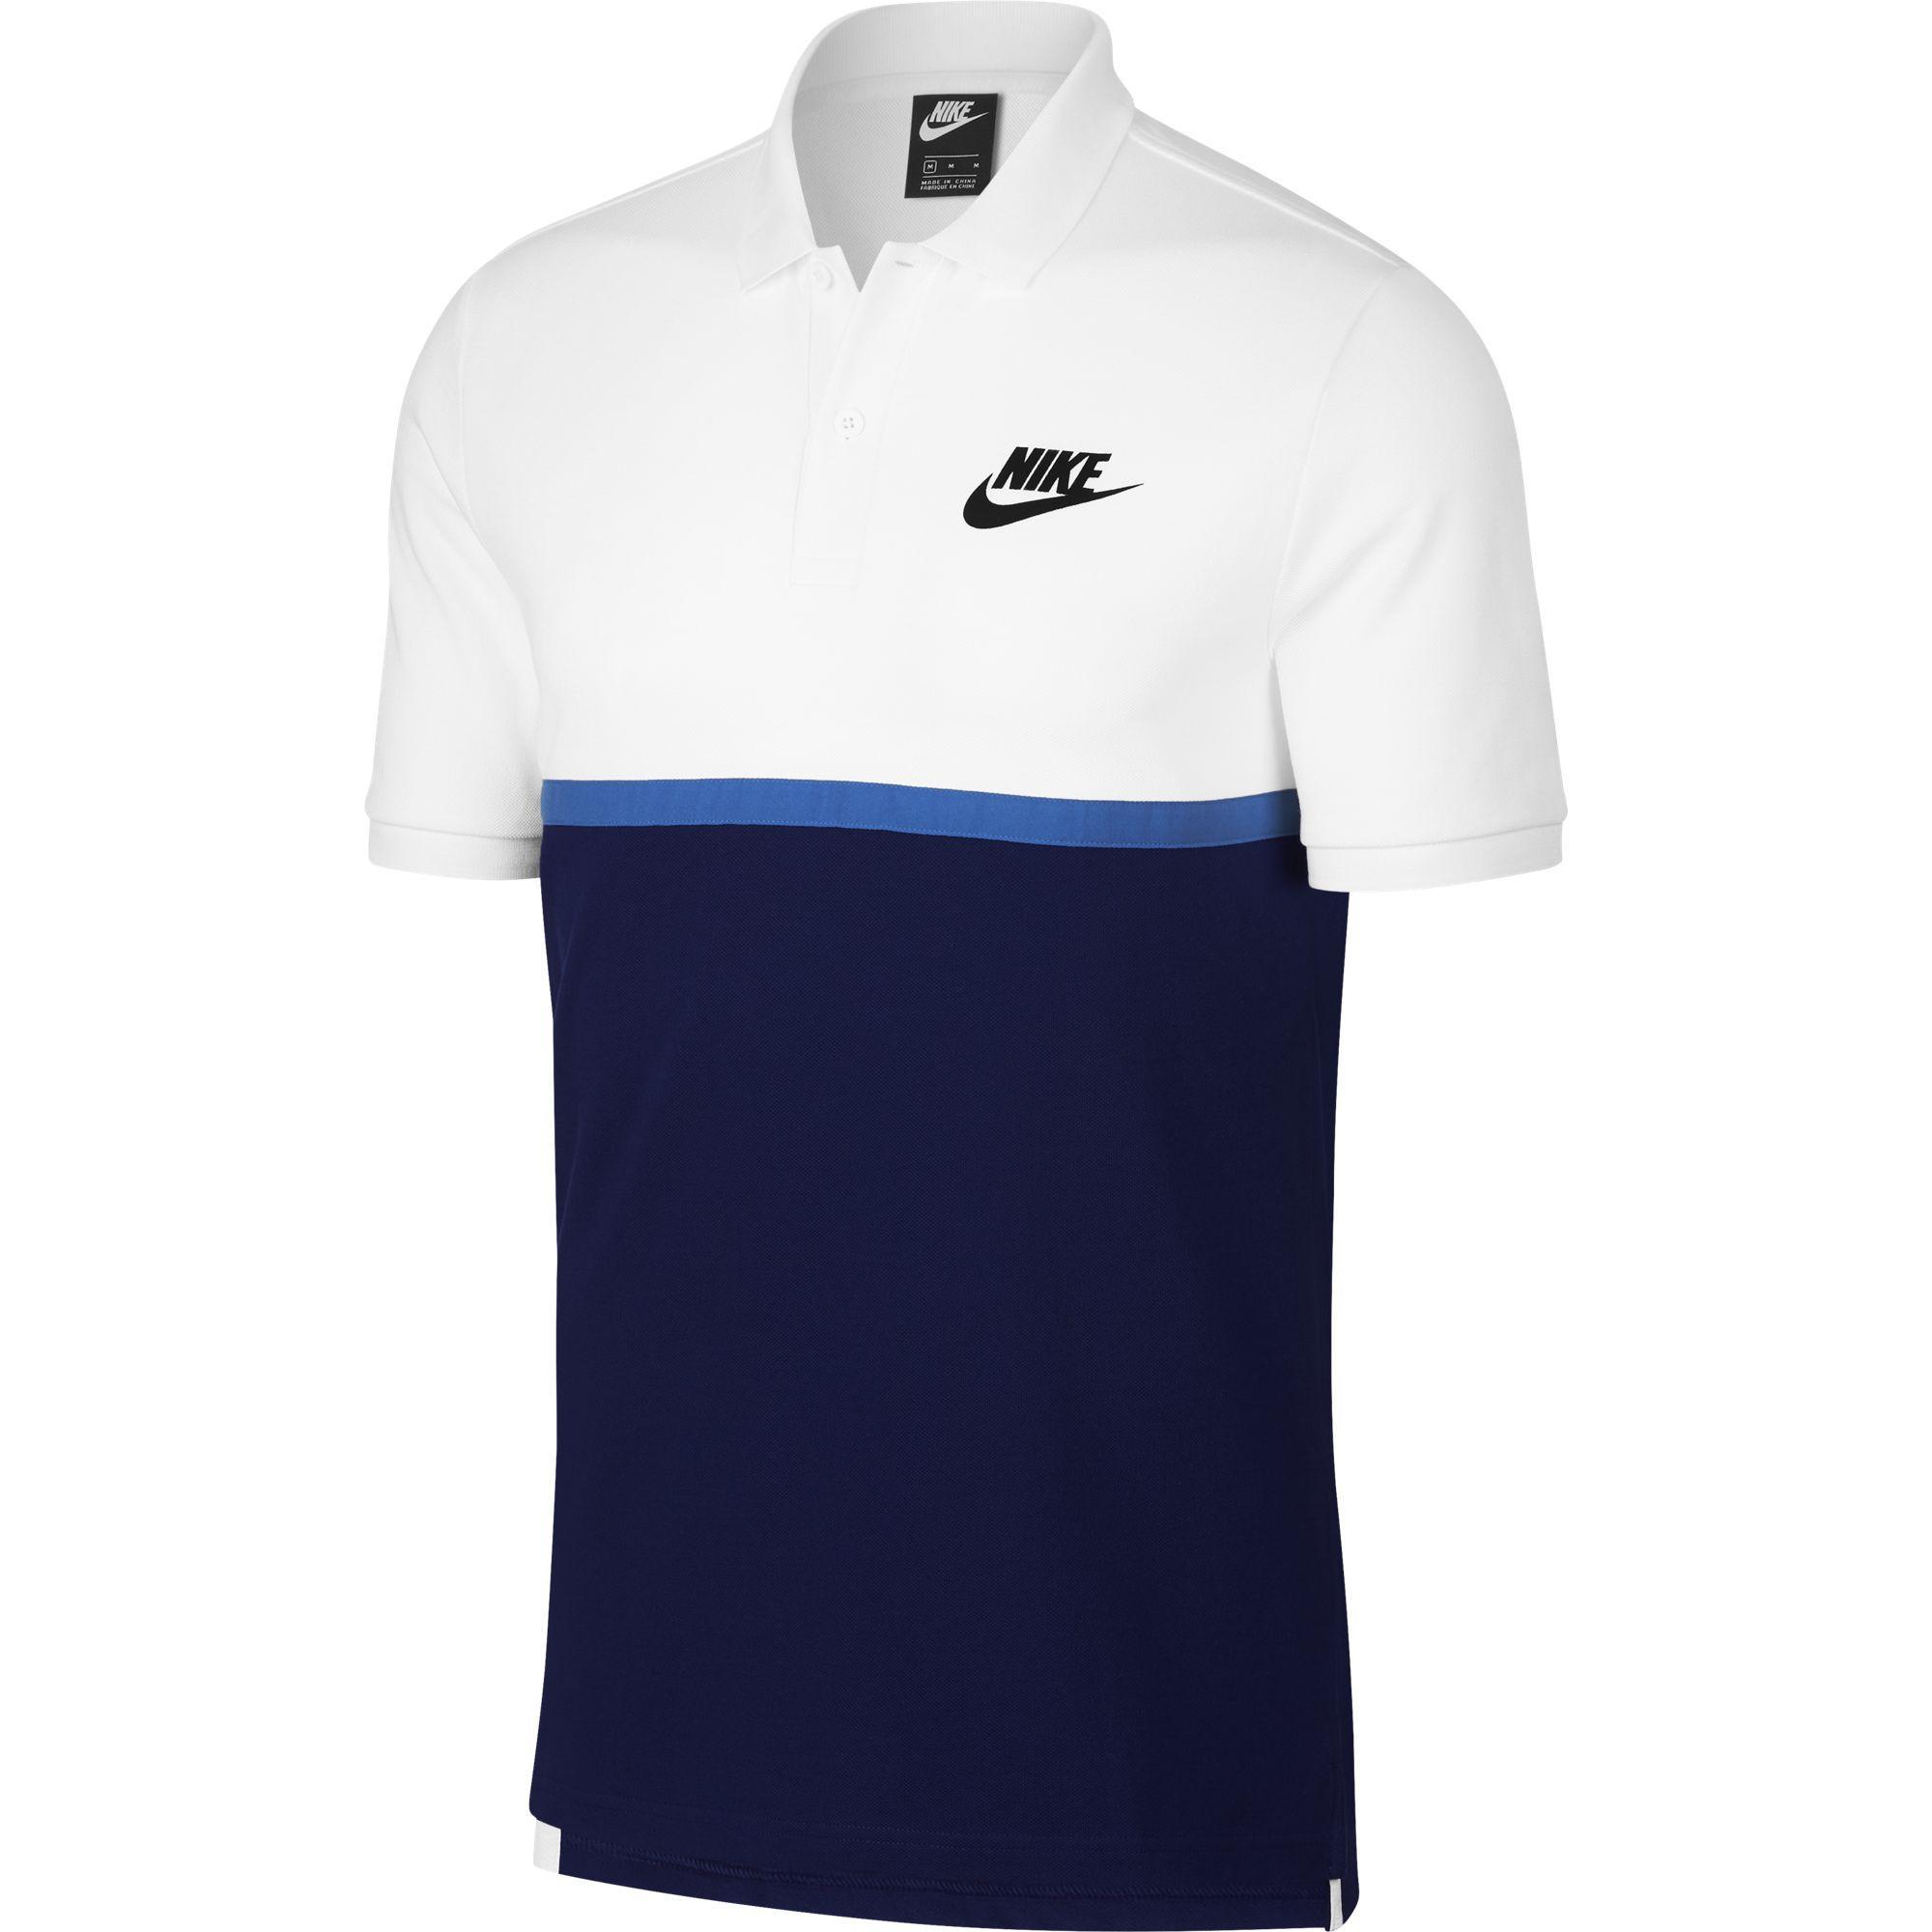 a38afba07 Nike Mens Sportswear Polo - White/Blue - Tennisnuts.com